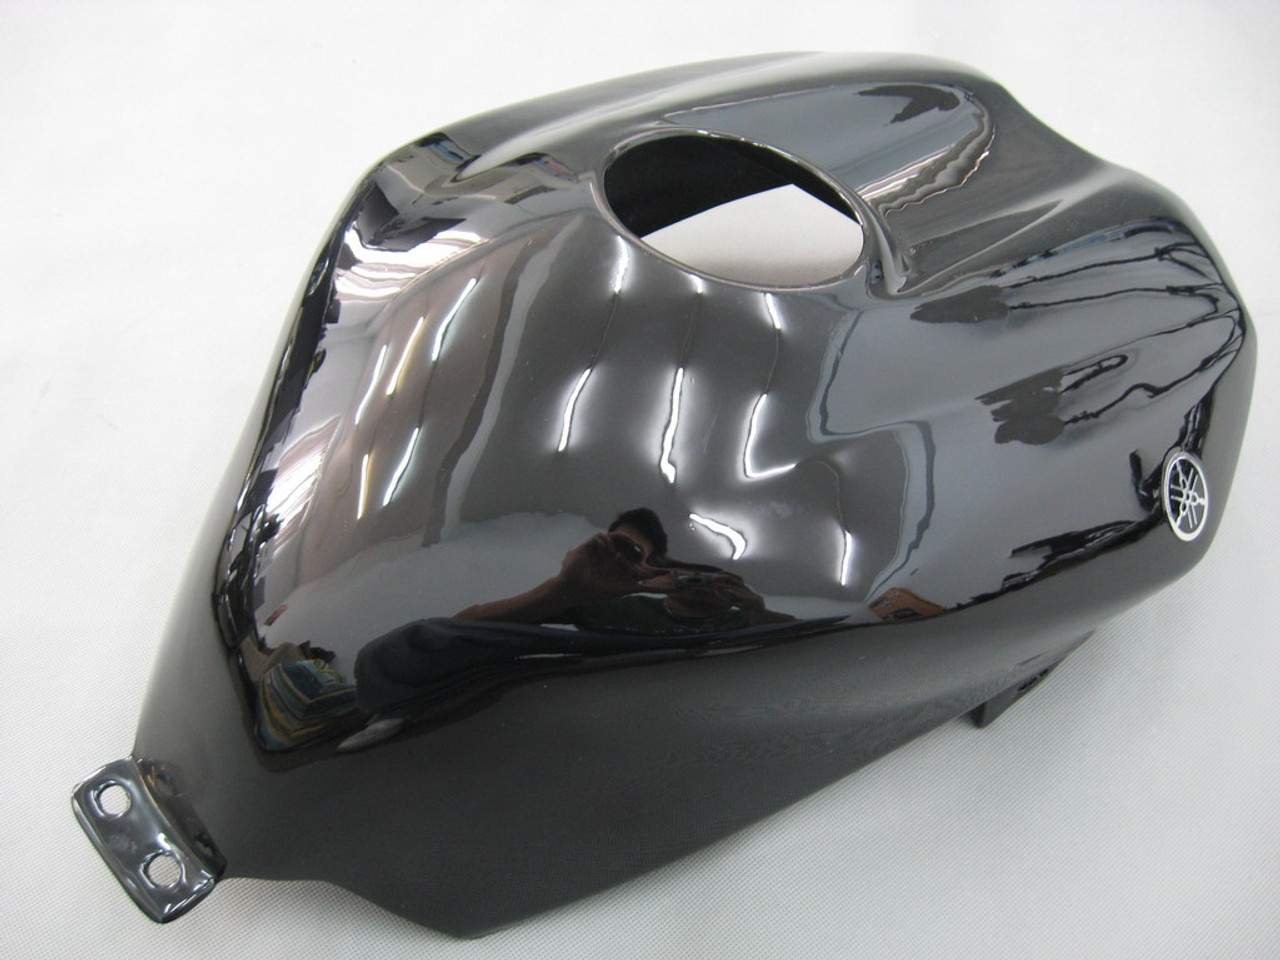 Fairings Yamaha YZF-R1 Black White R1 Racing (2004-2006)